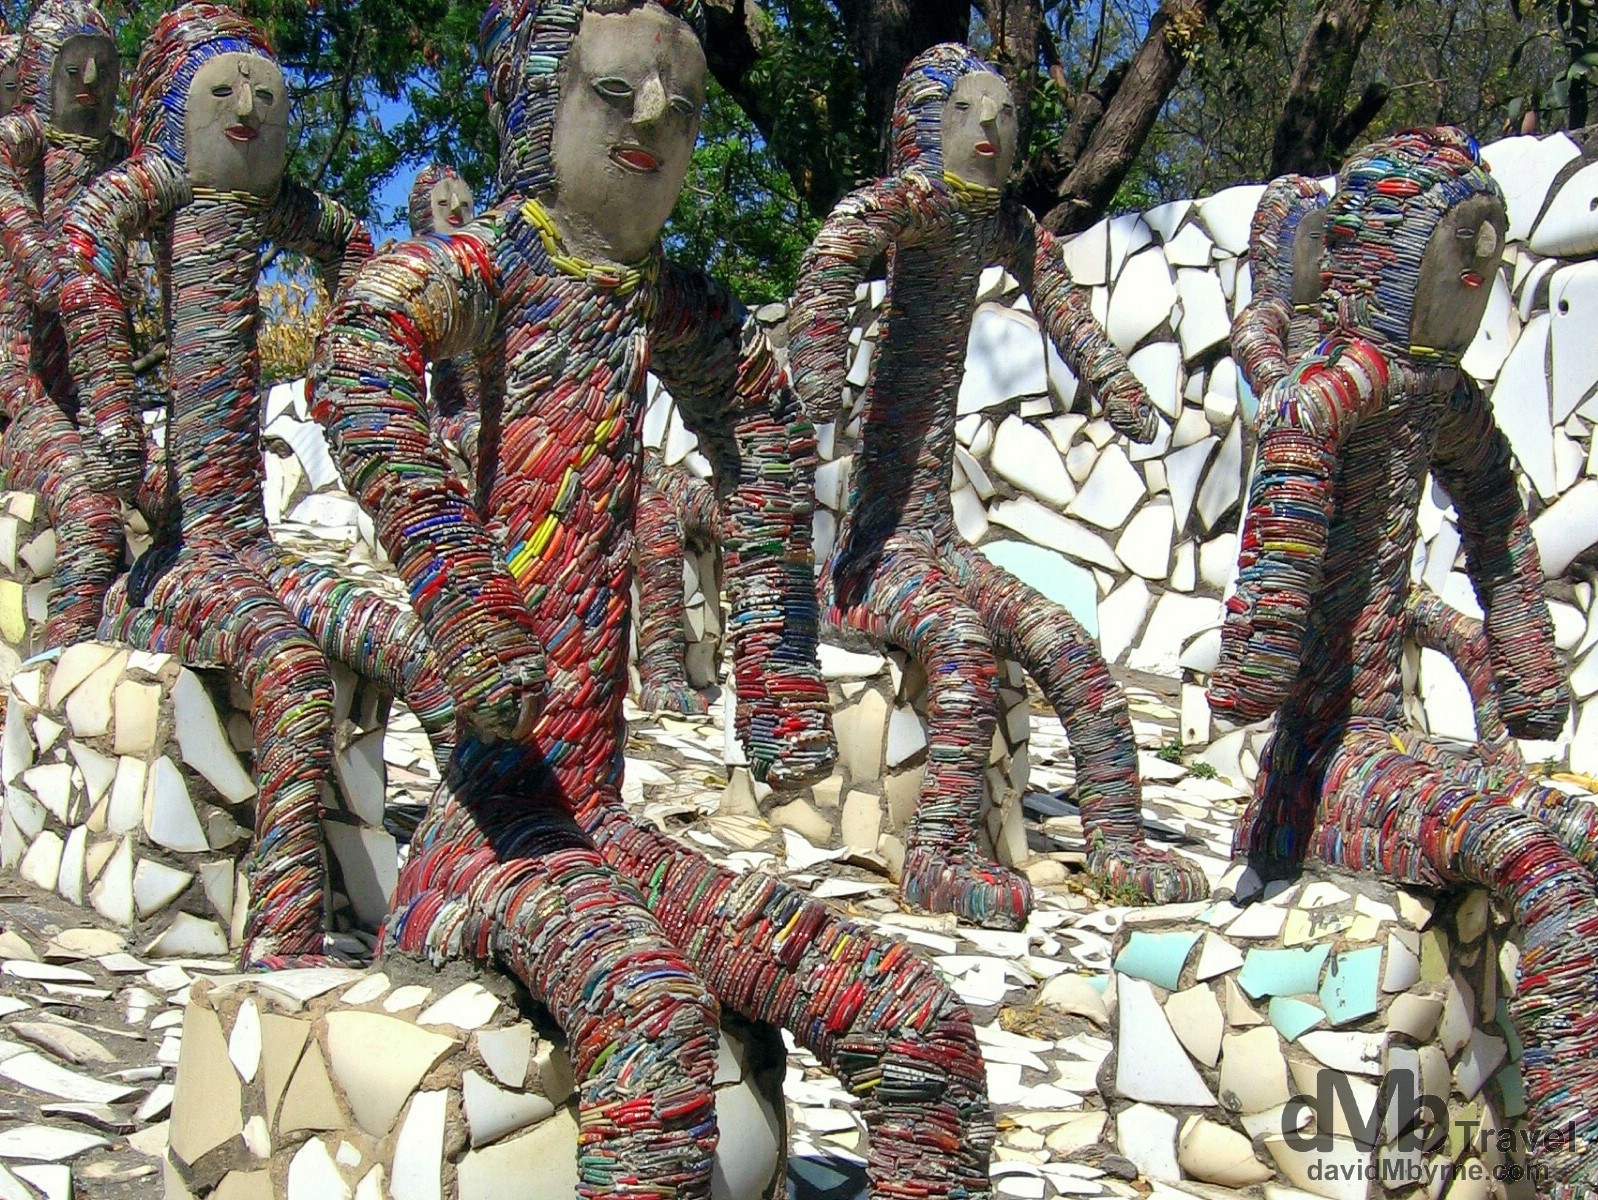 Sculptures in the Rock Garden in Chandigarh, Punjab, India. March 23, 2008.